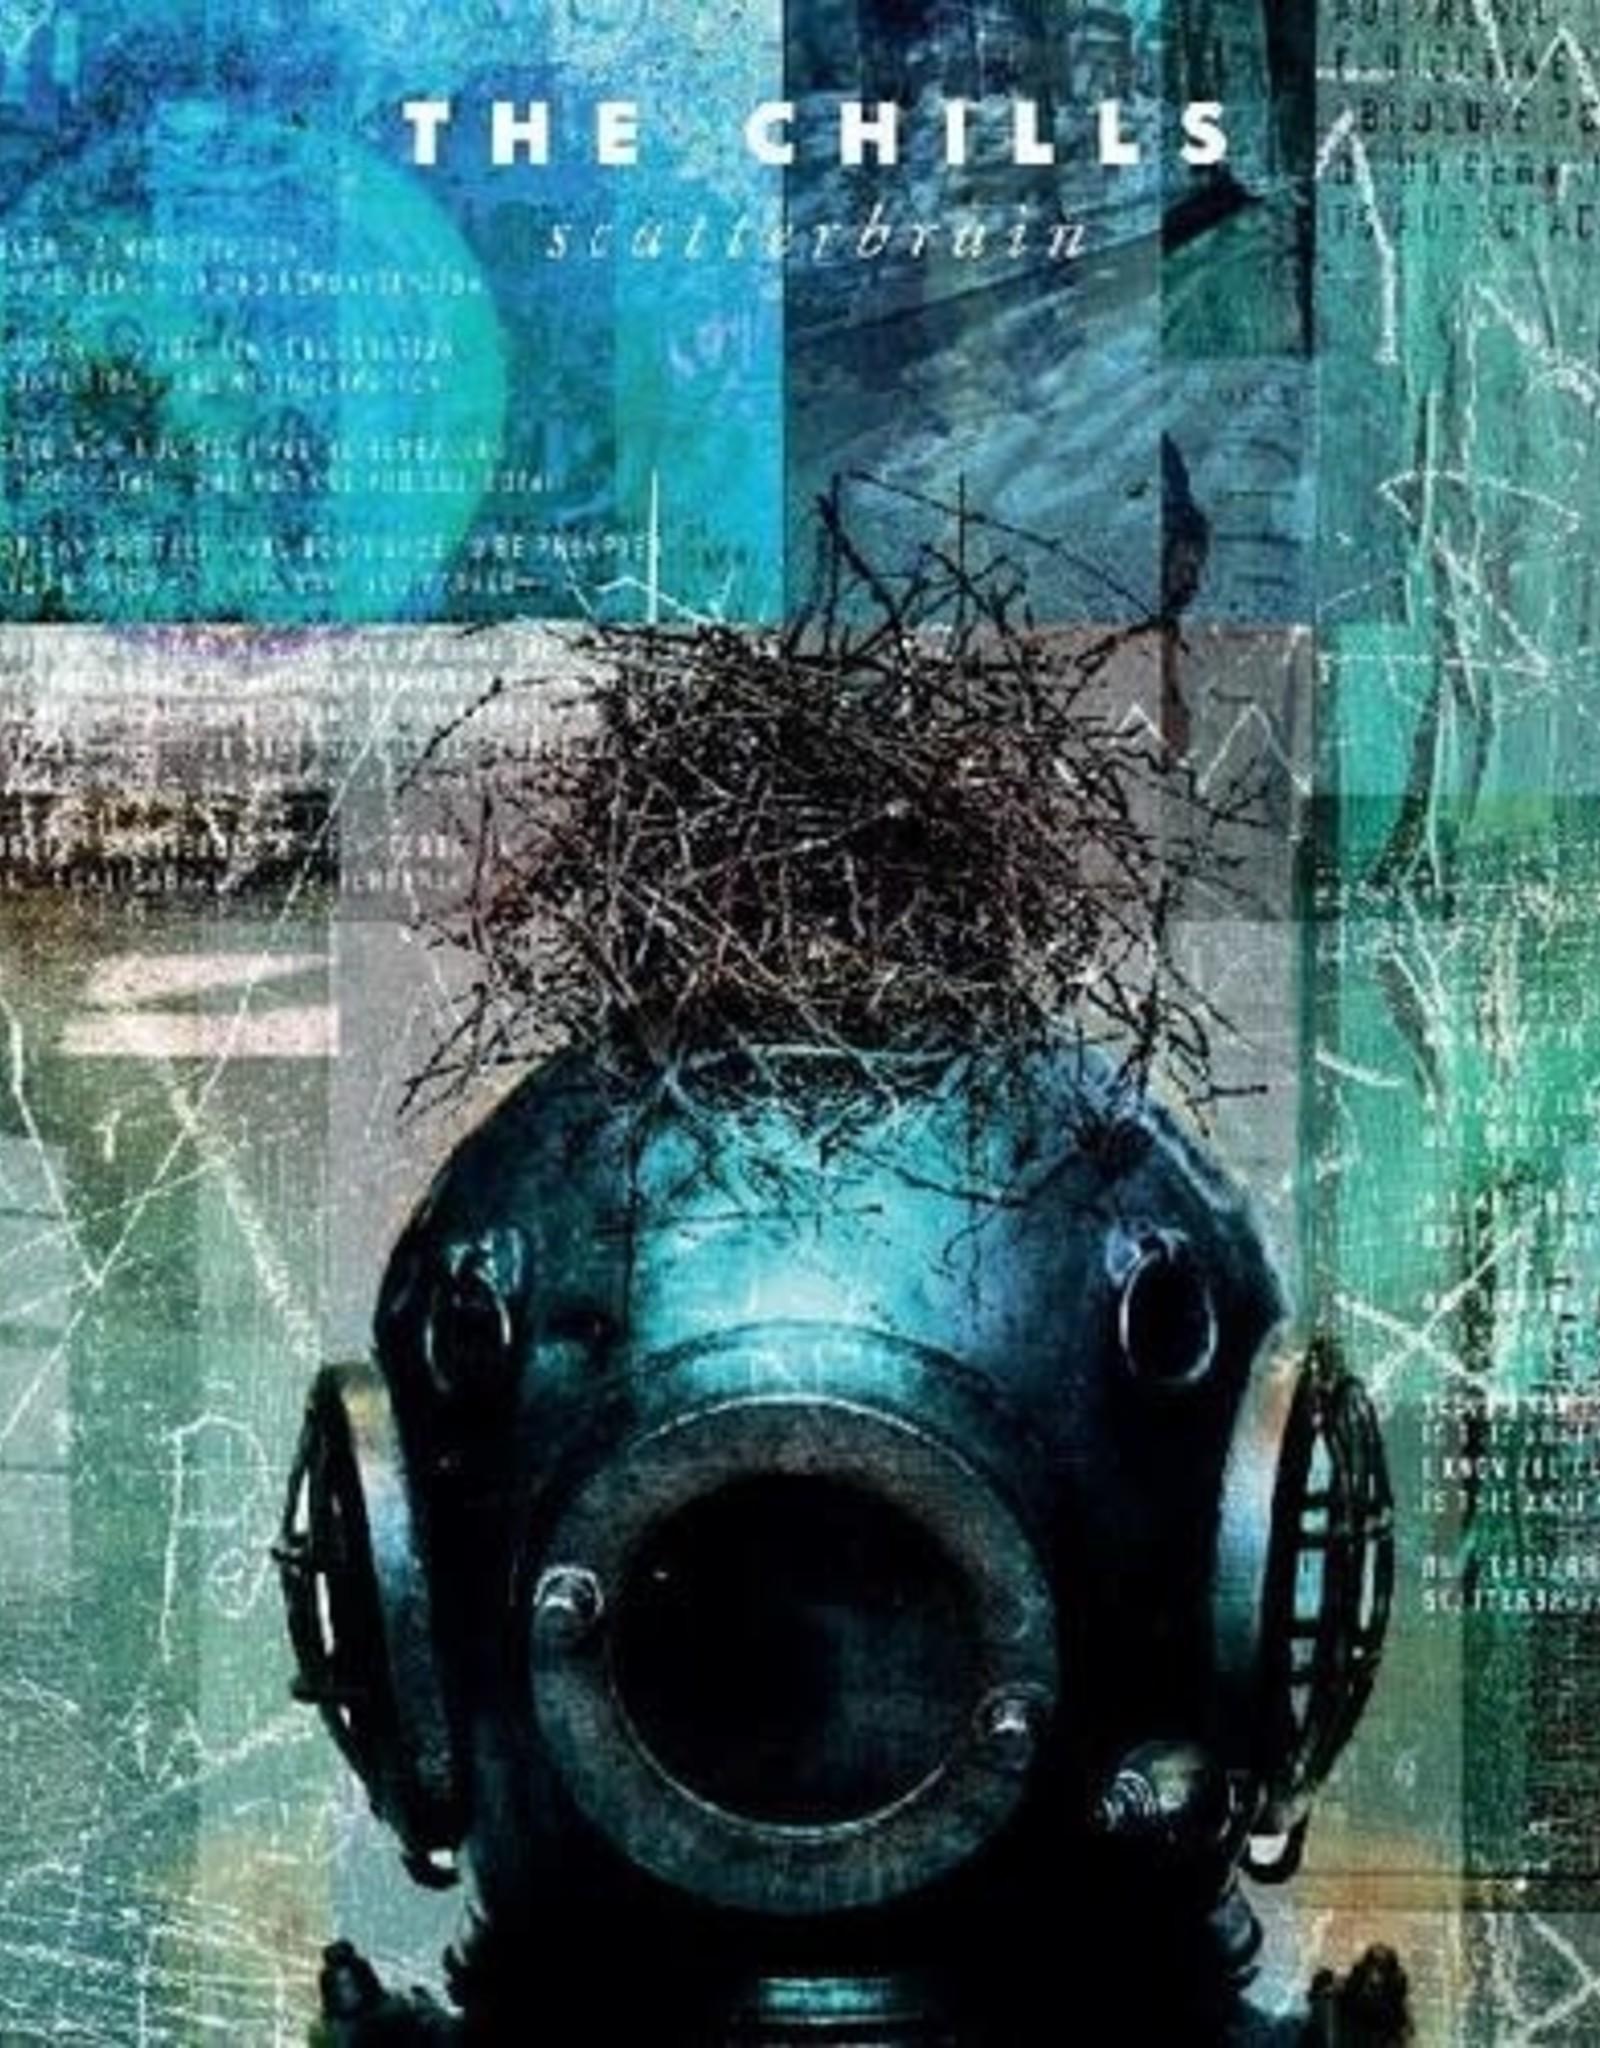 The Chills - Scatterbrain (Blue Vinyl, Indie Exclusive)